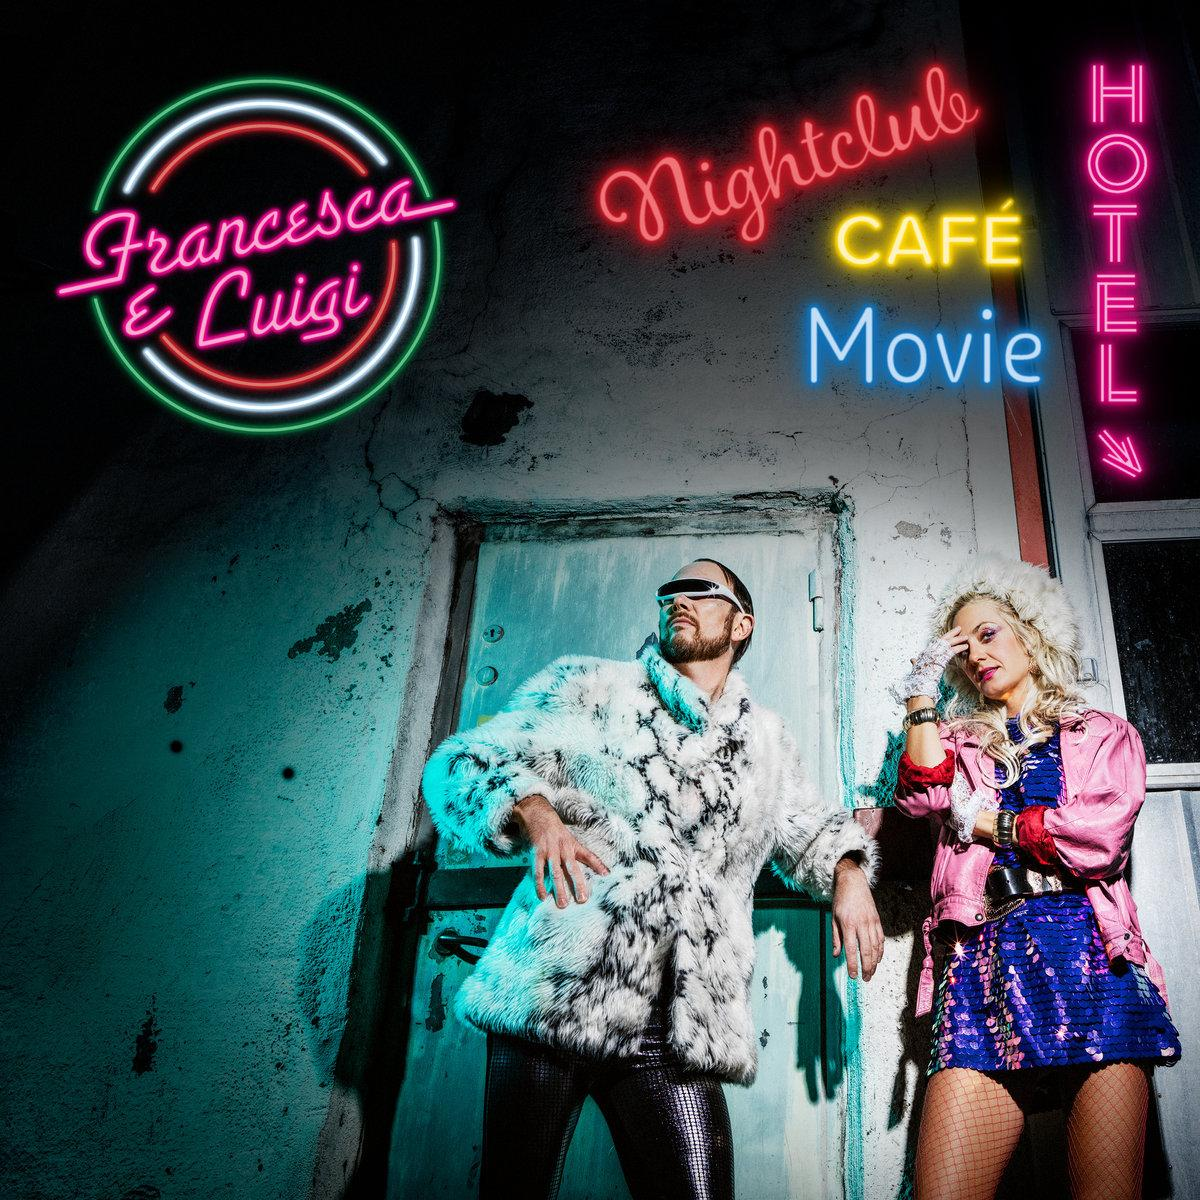 Francesca e Luigi - Nightclub, Café, Movie, Hotel